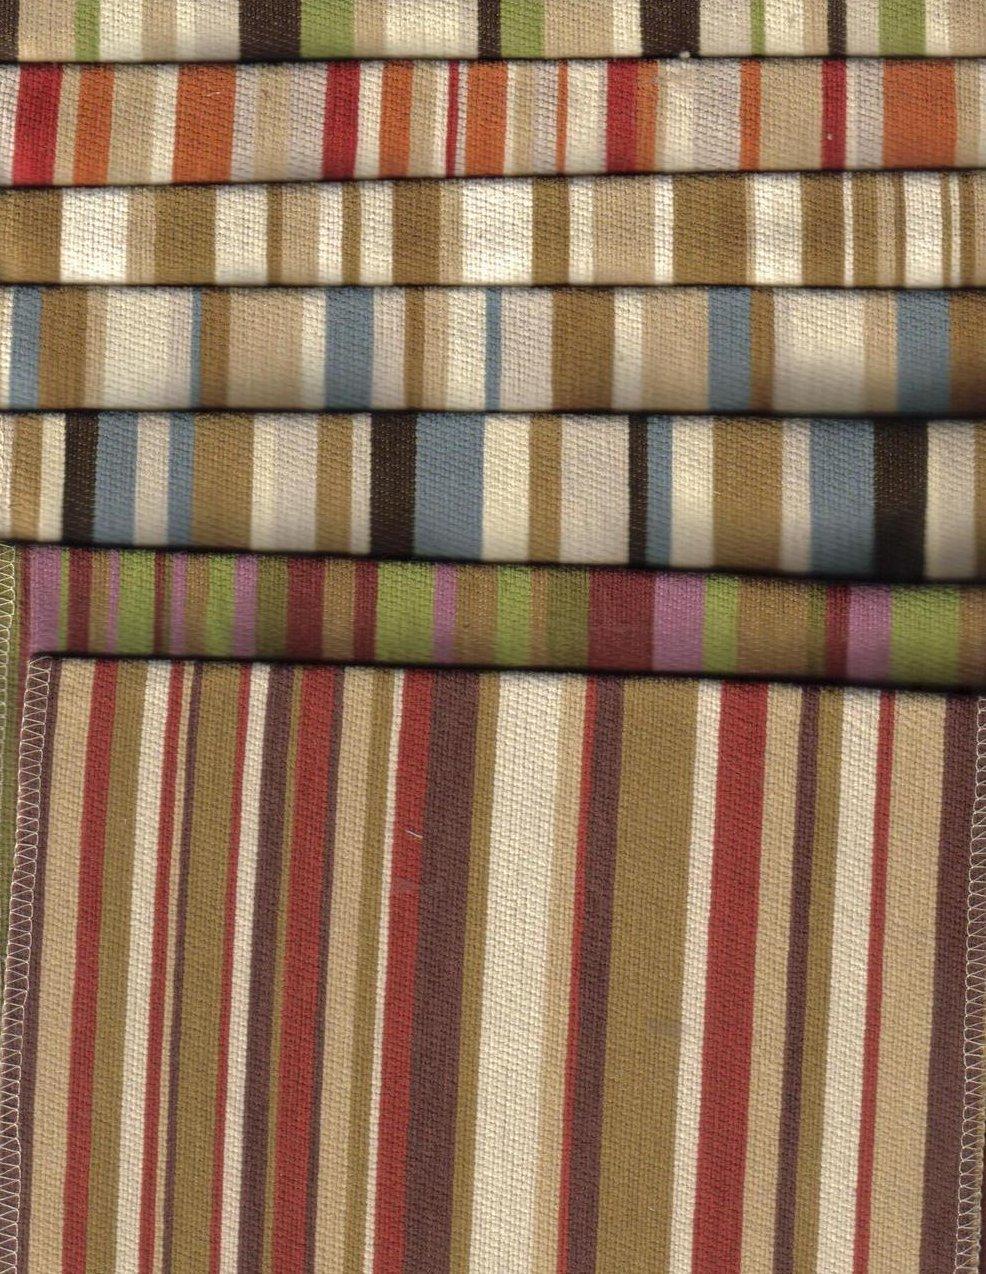 Image 2 of Selection of Striped Fabrics 7 lg pcs Various Colors Villa Nova